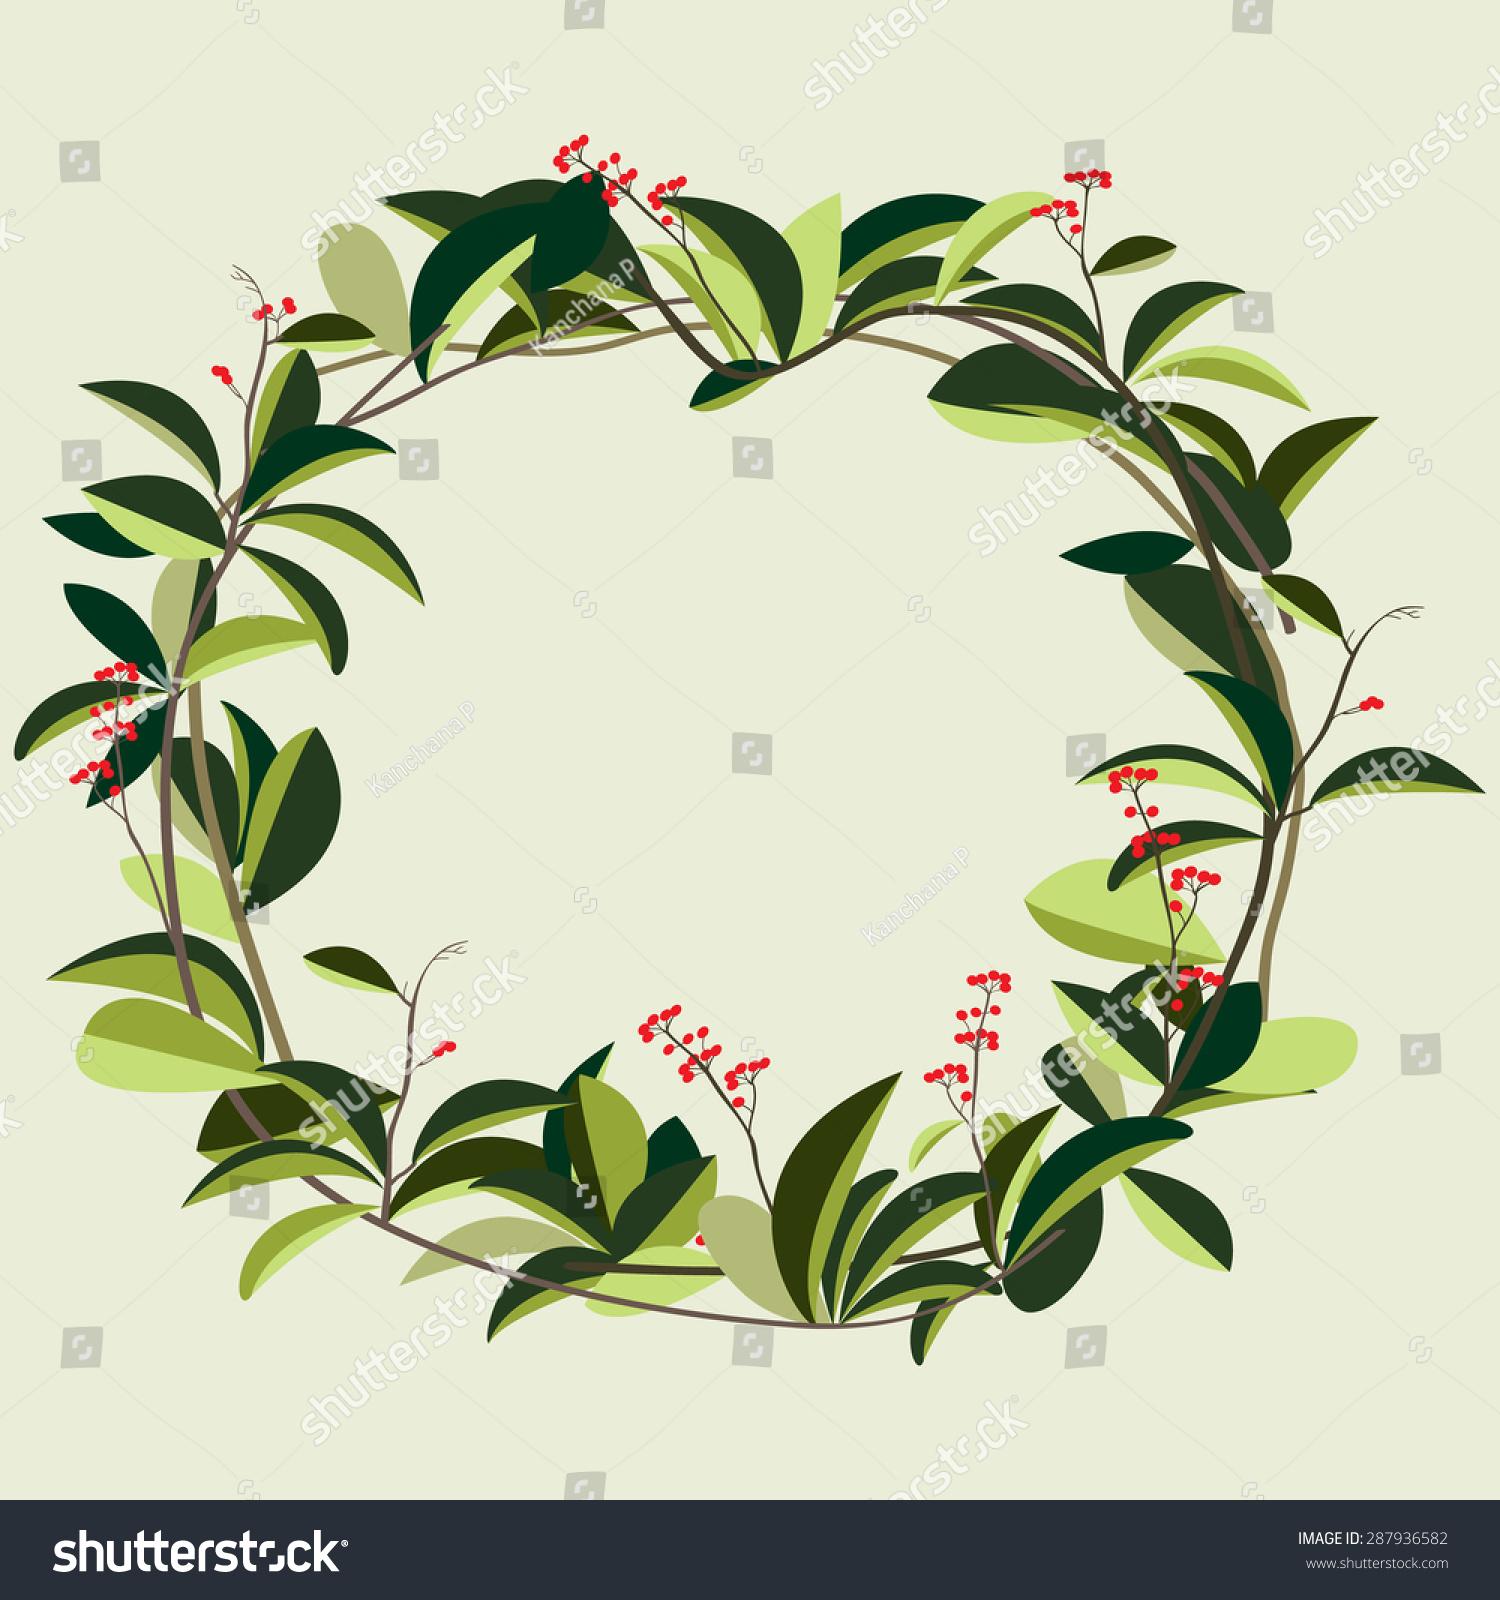 Wreath Of Creeper Flower Vine Plant Vector Illustration ...  Wreath Of Creep...